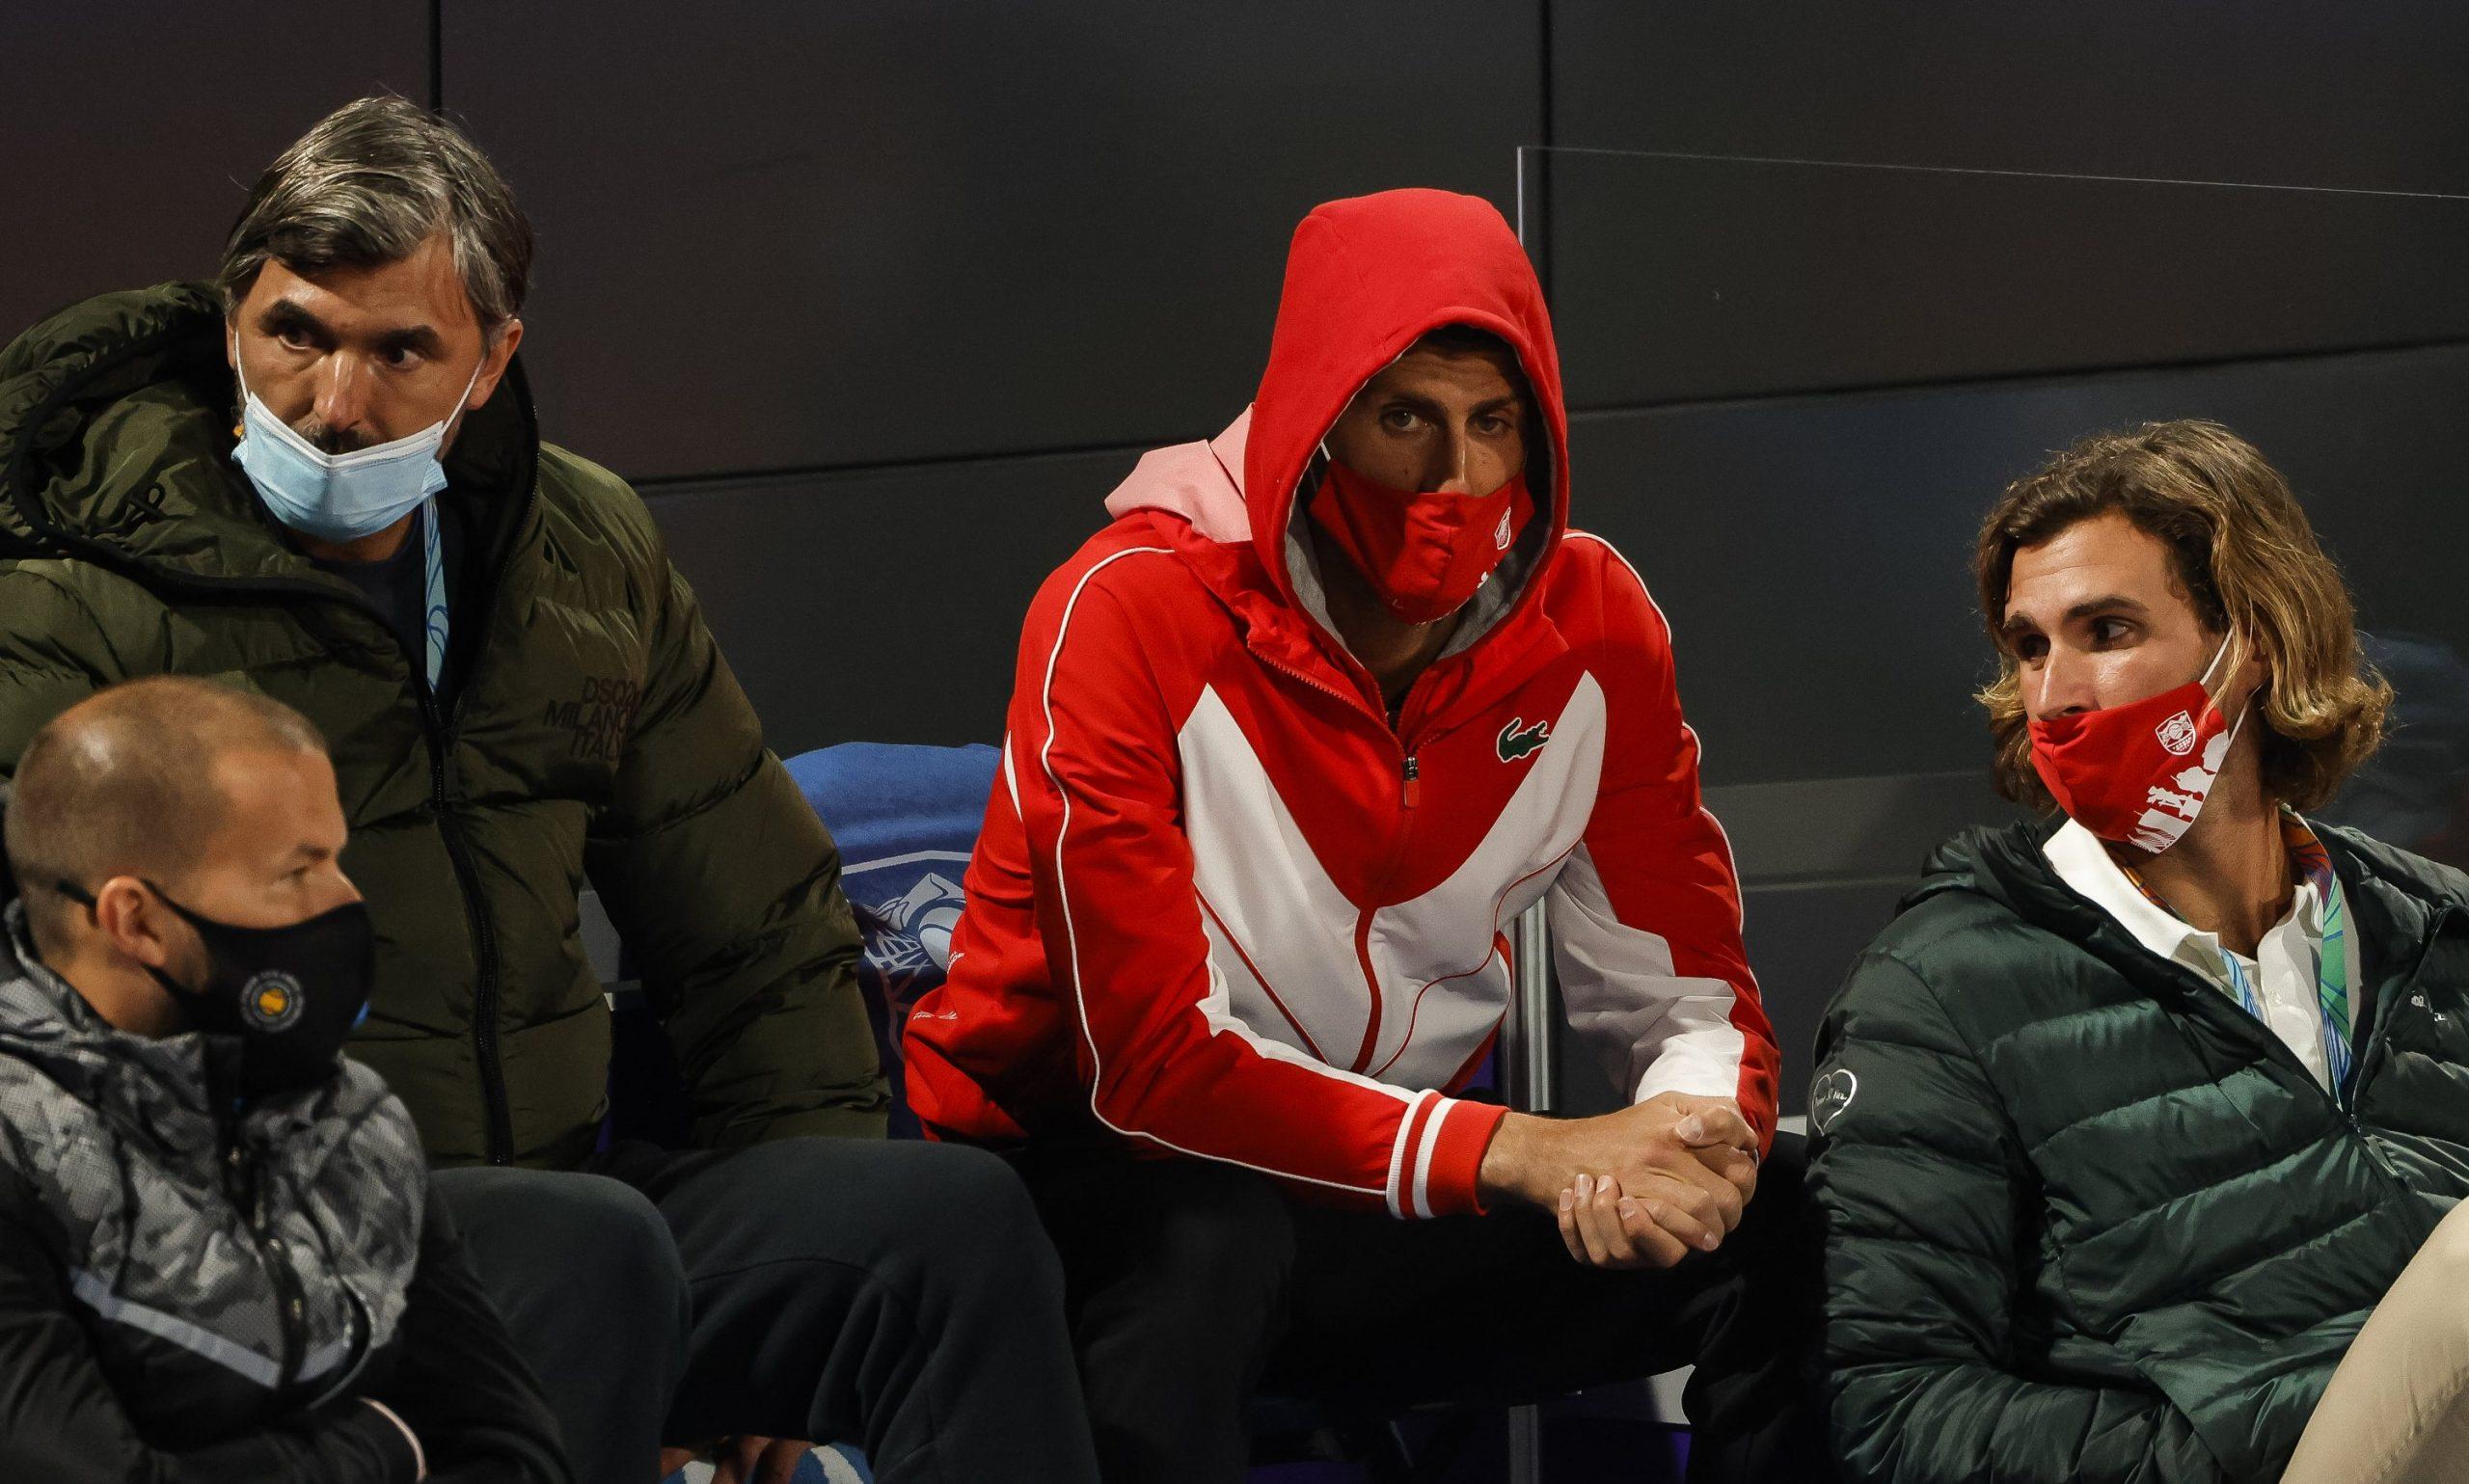 Marko i Novak Đoković Goran Ivanišević Serbia Open 2021